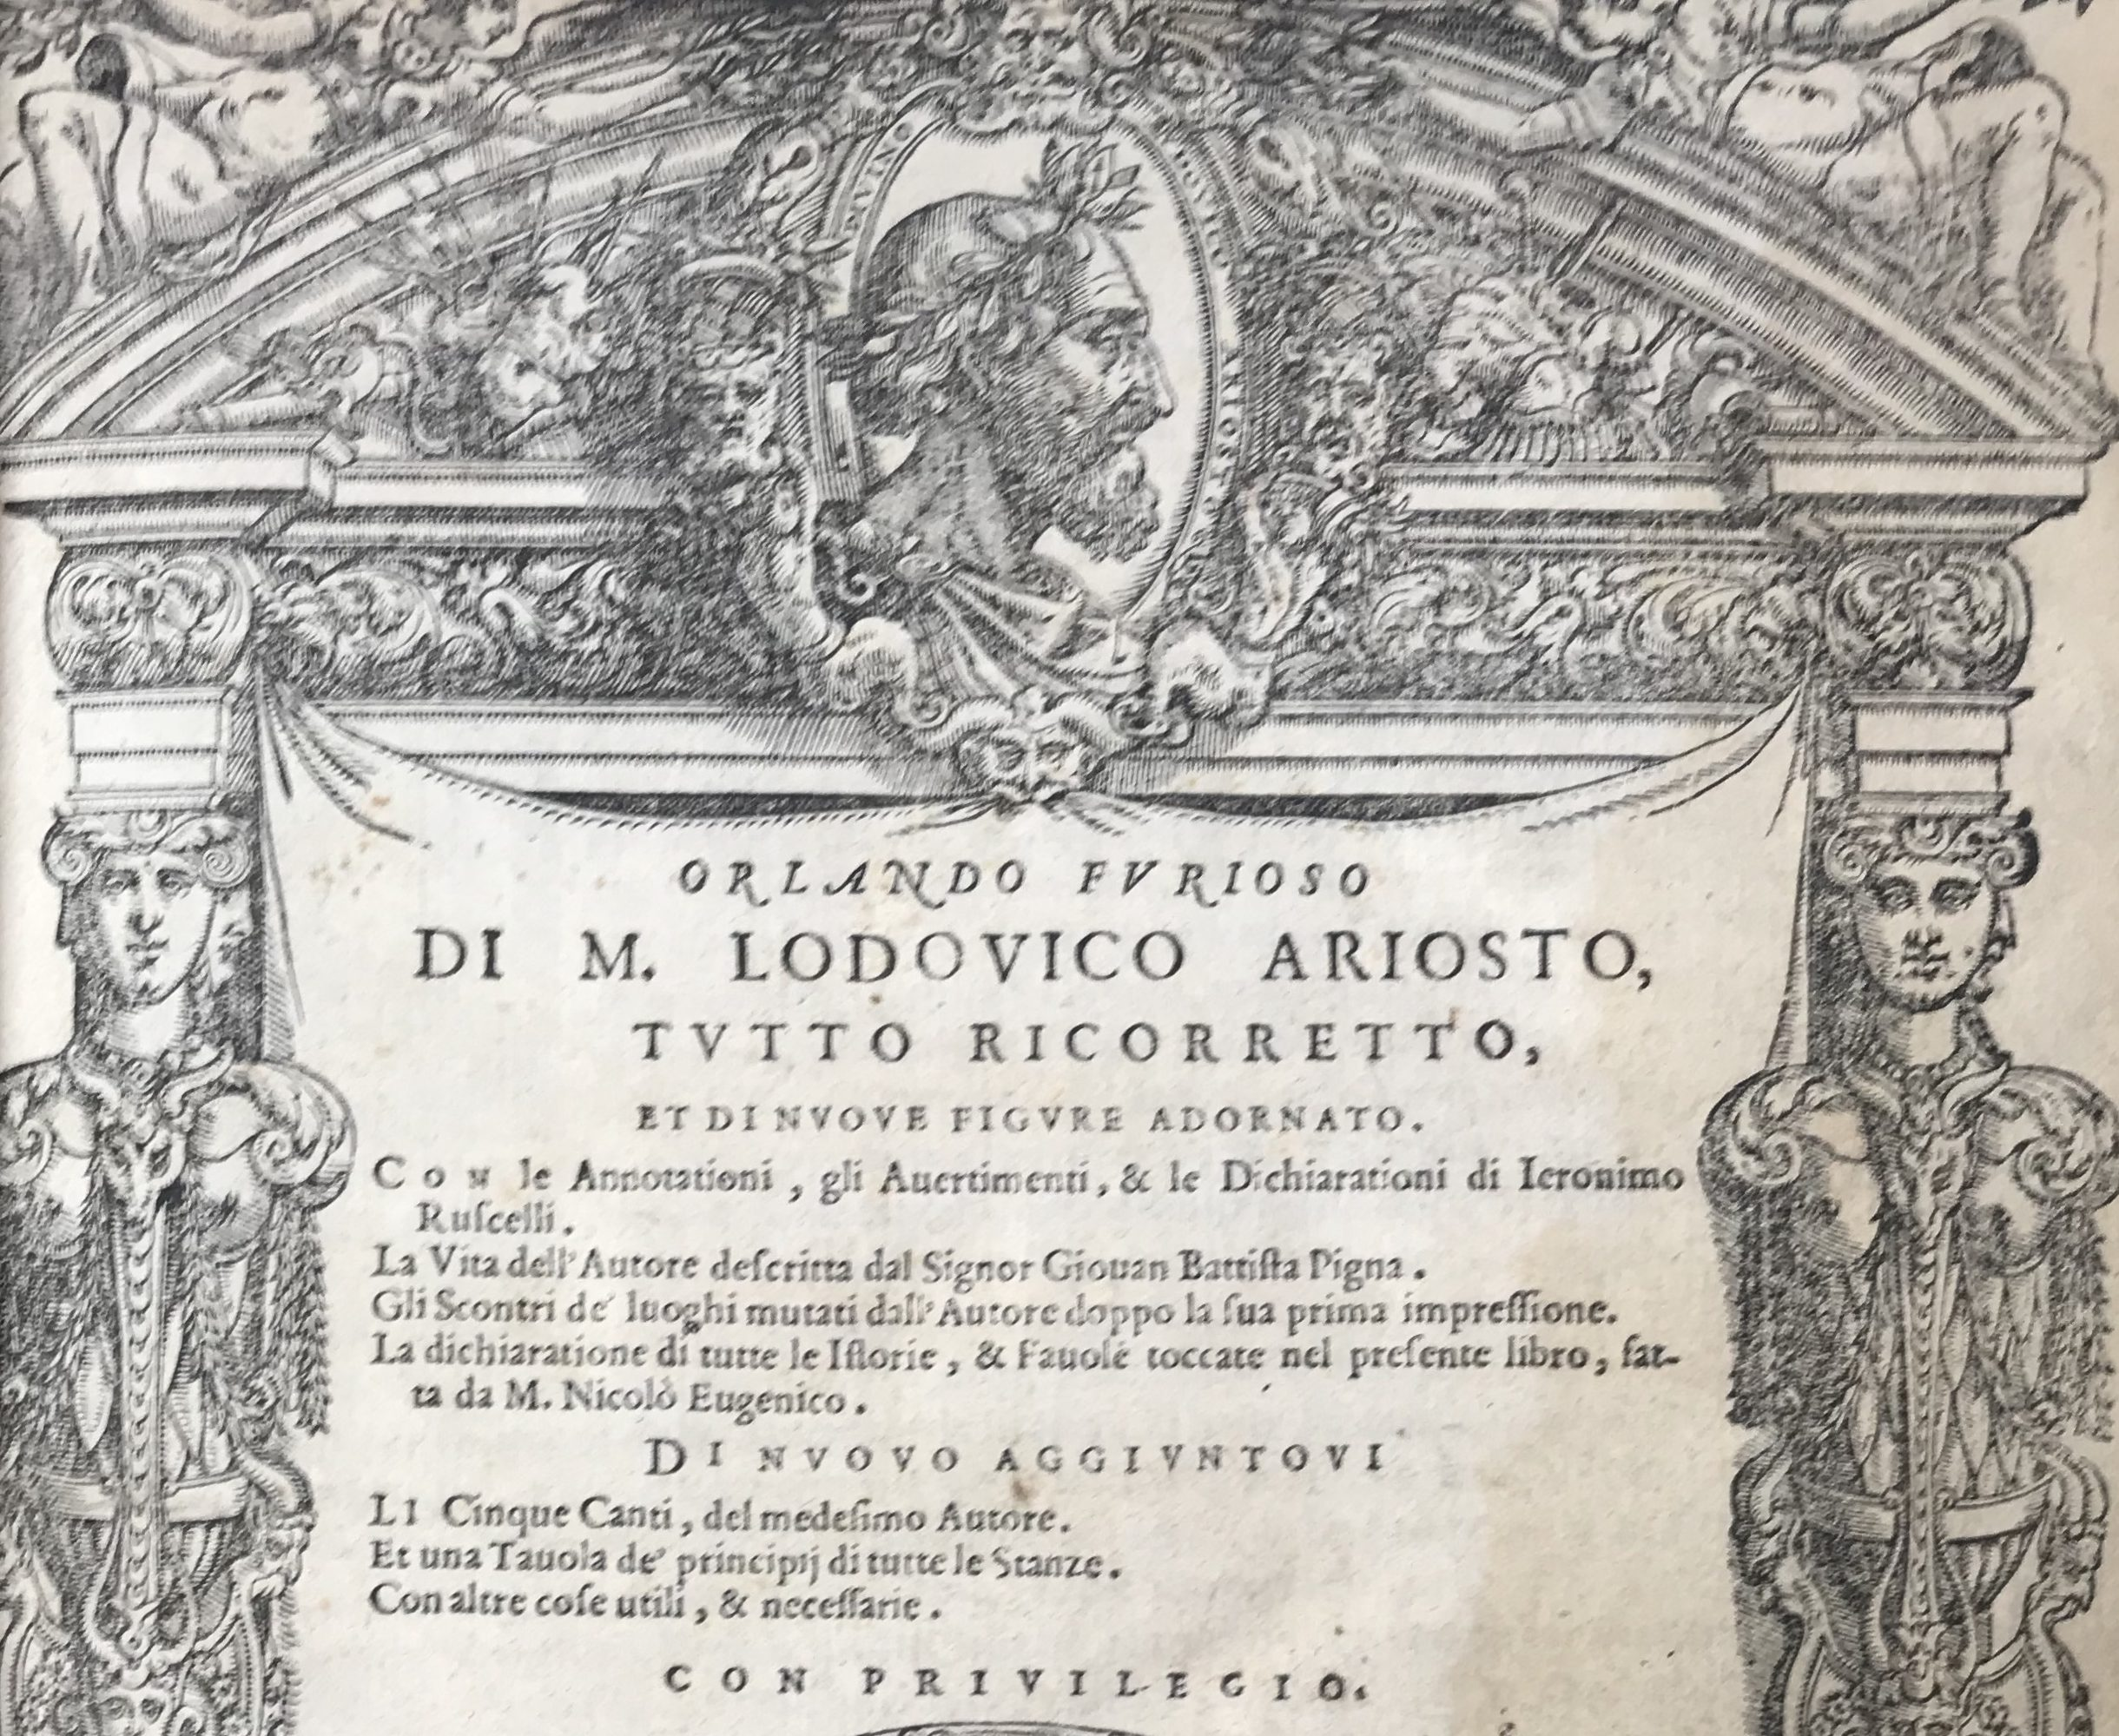 ARIOSTO, Lodovico (RUSCELLI, Girolamo)